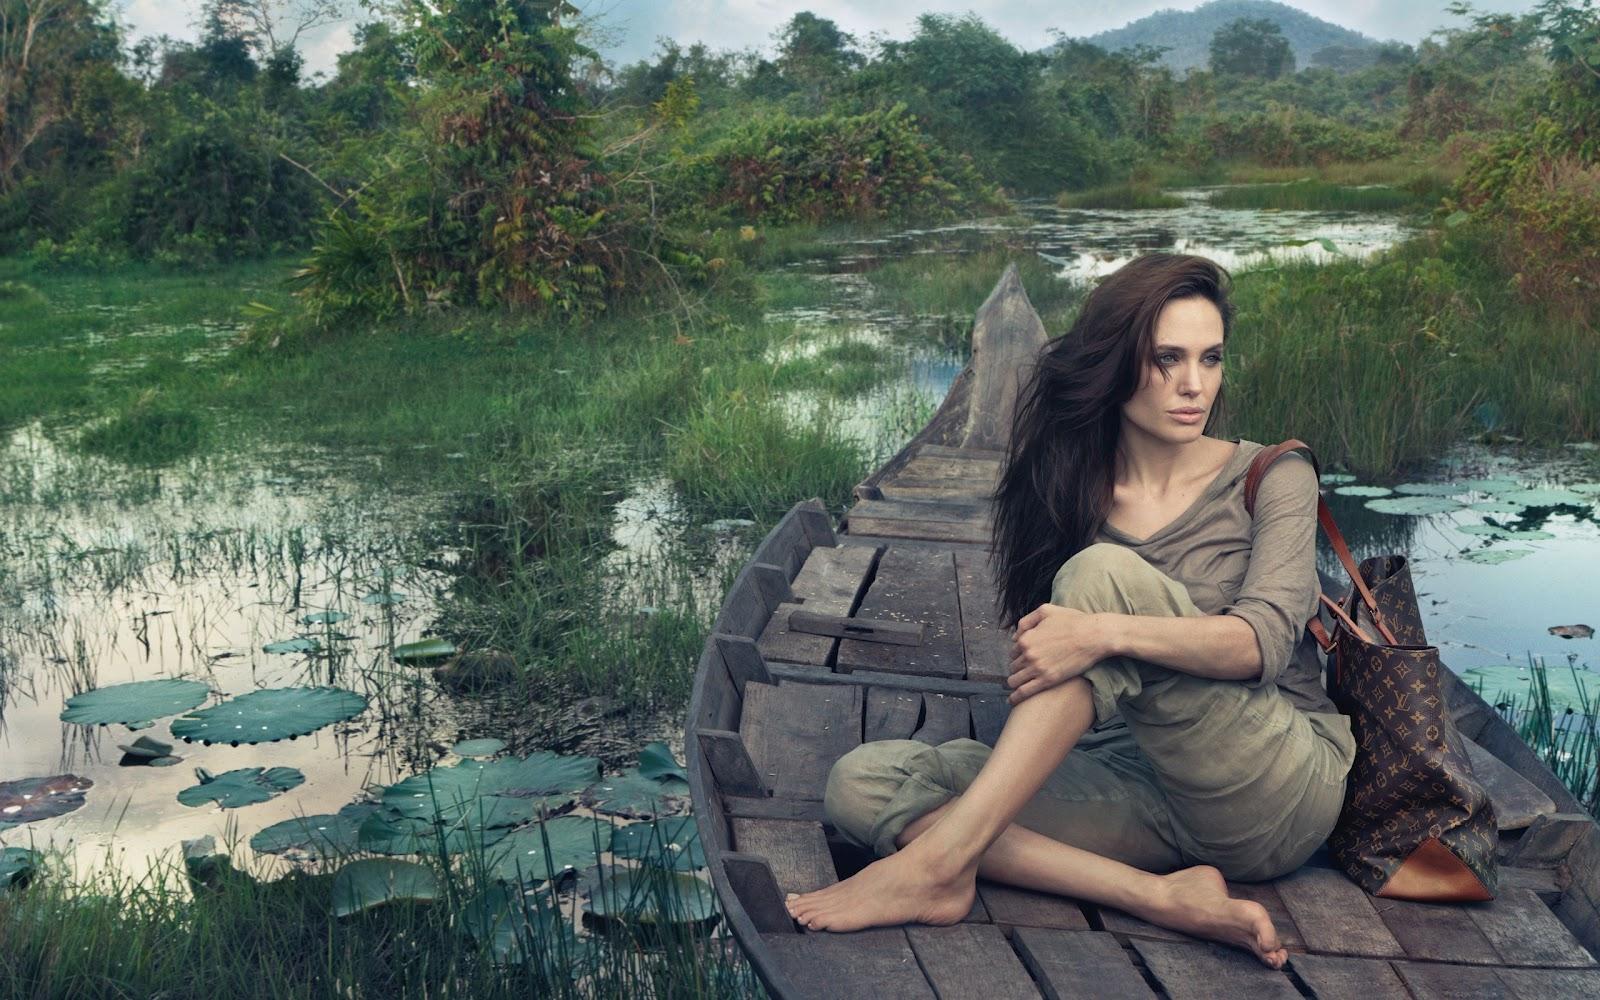 http://4.bp.blogspot.com/-u7kbHnROeSE/T257DTCNfFI/AAAAAAAAQh8/I8tdMjPCZGk/s1600/Angelina+Jolie+HD+Wallpaper-6.jpg